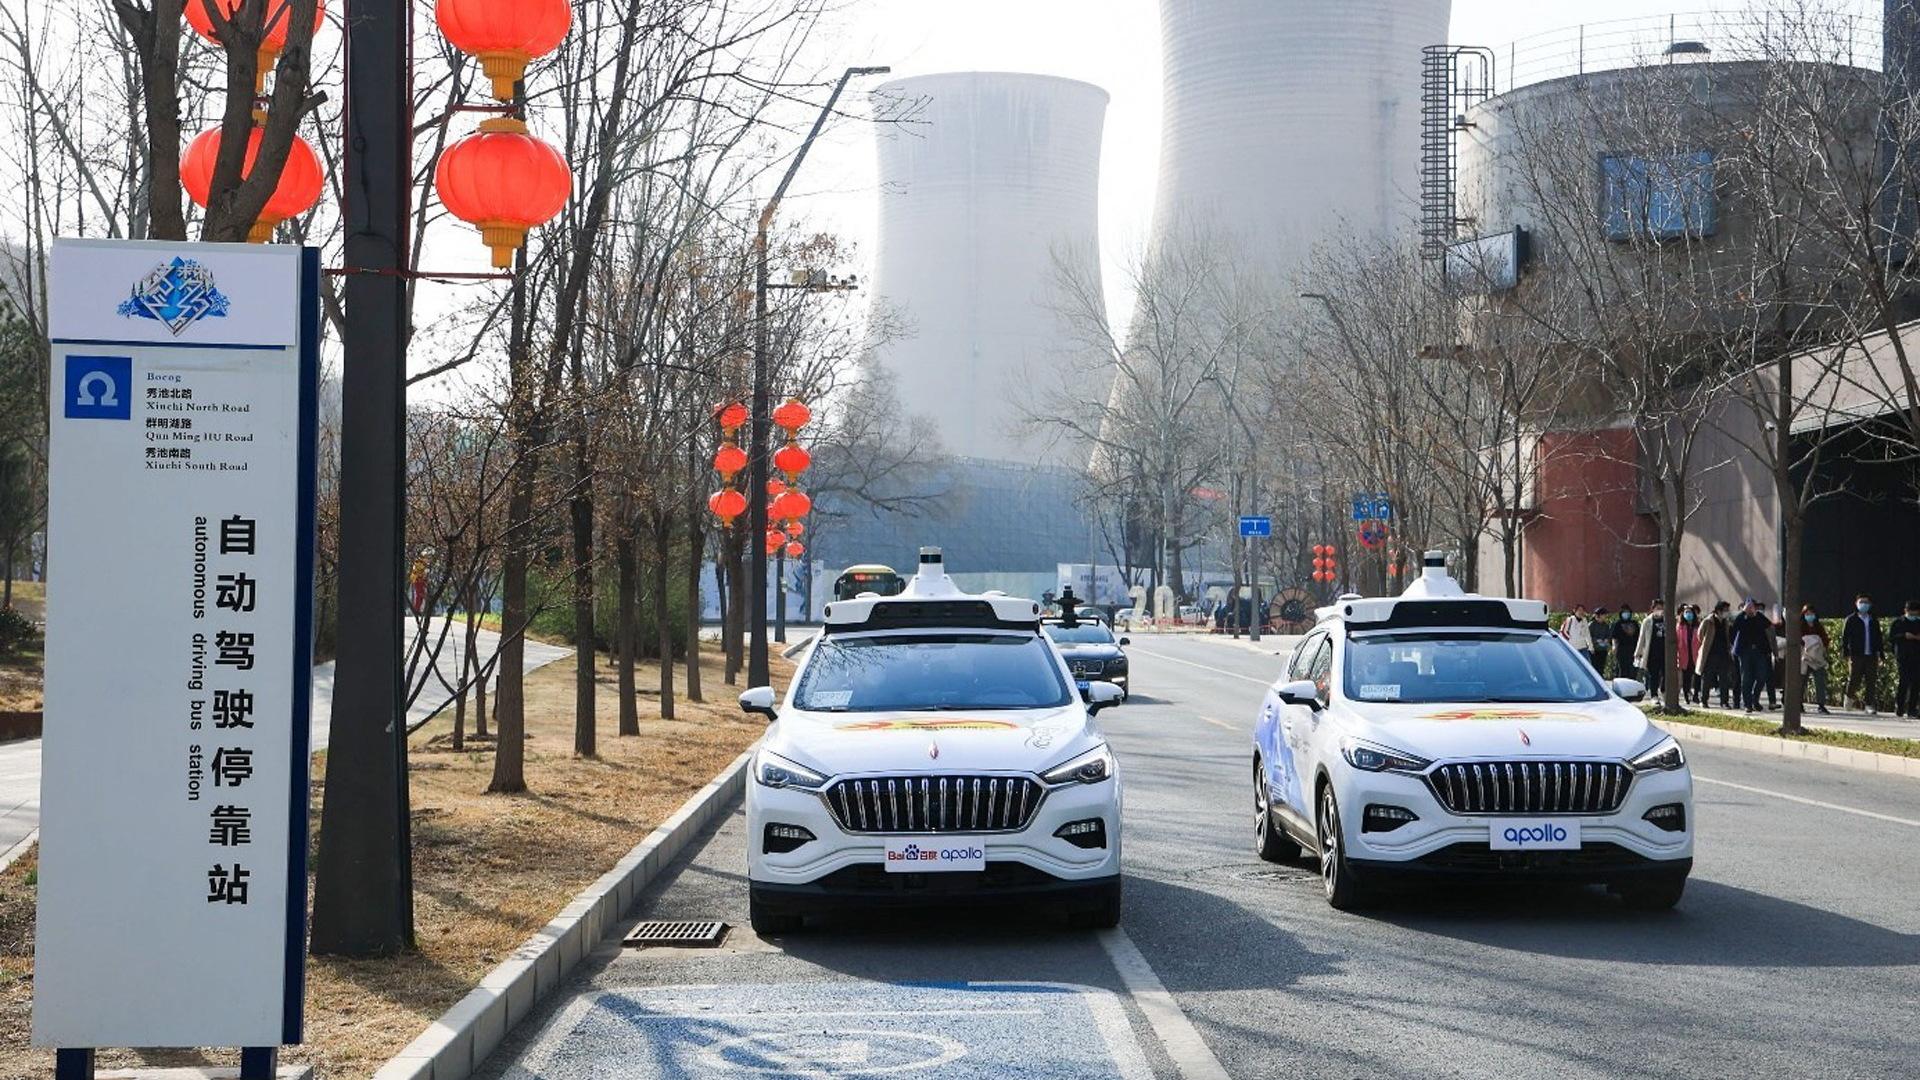 Baidu's Apollo Go driverless taxi service